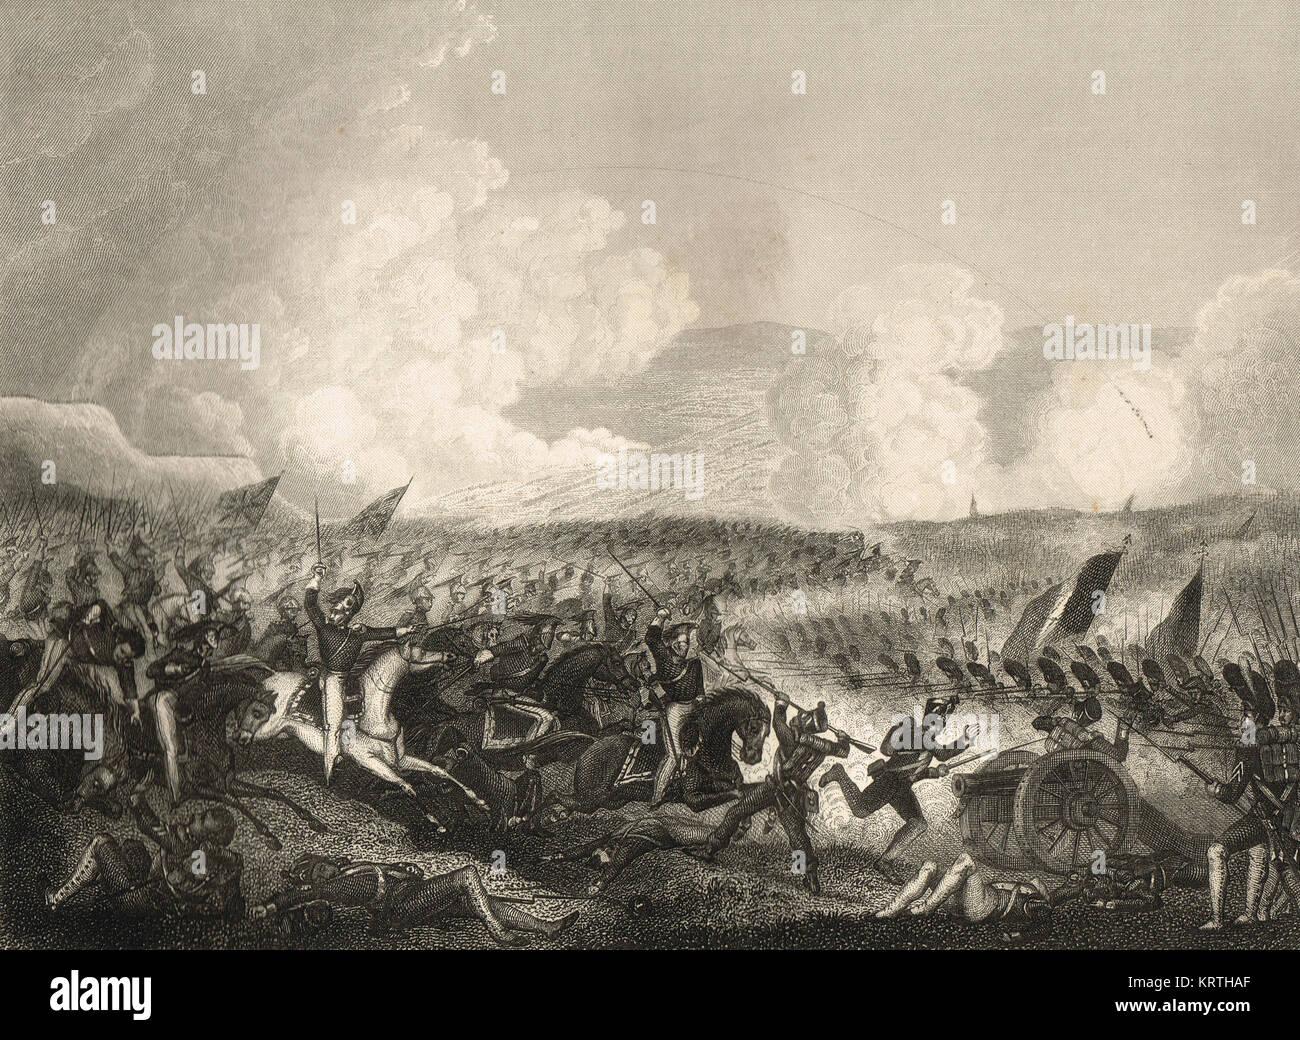 The Battle of Salamanca, 22 July 1812 - Stock Image